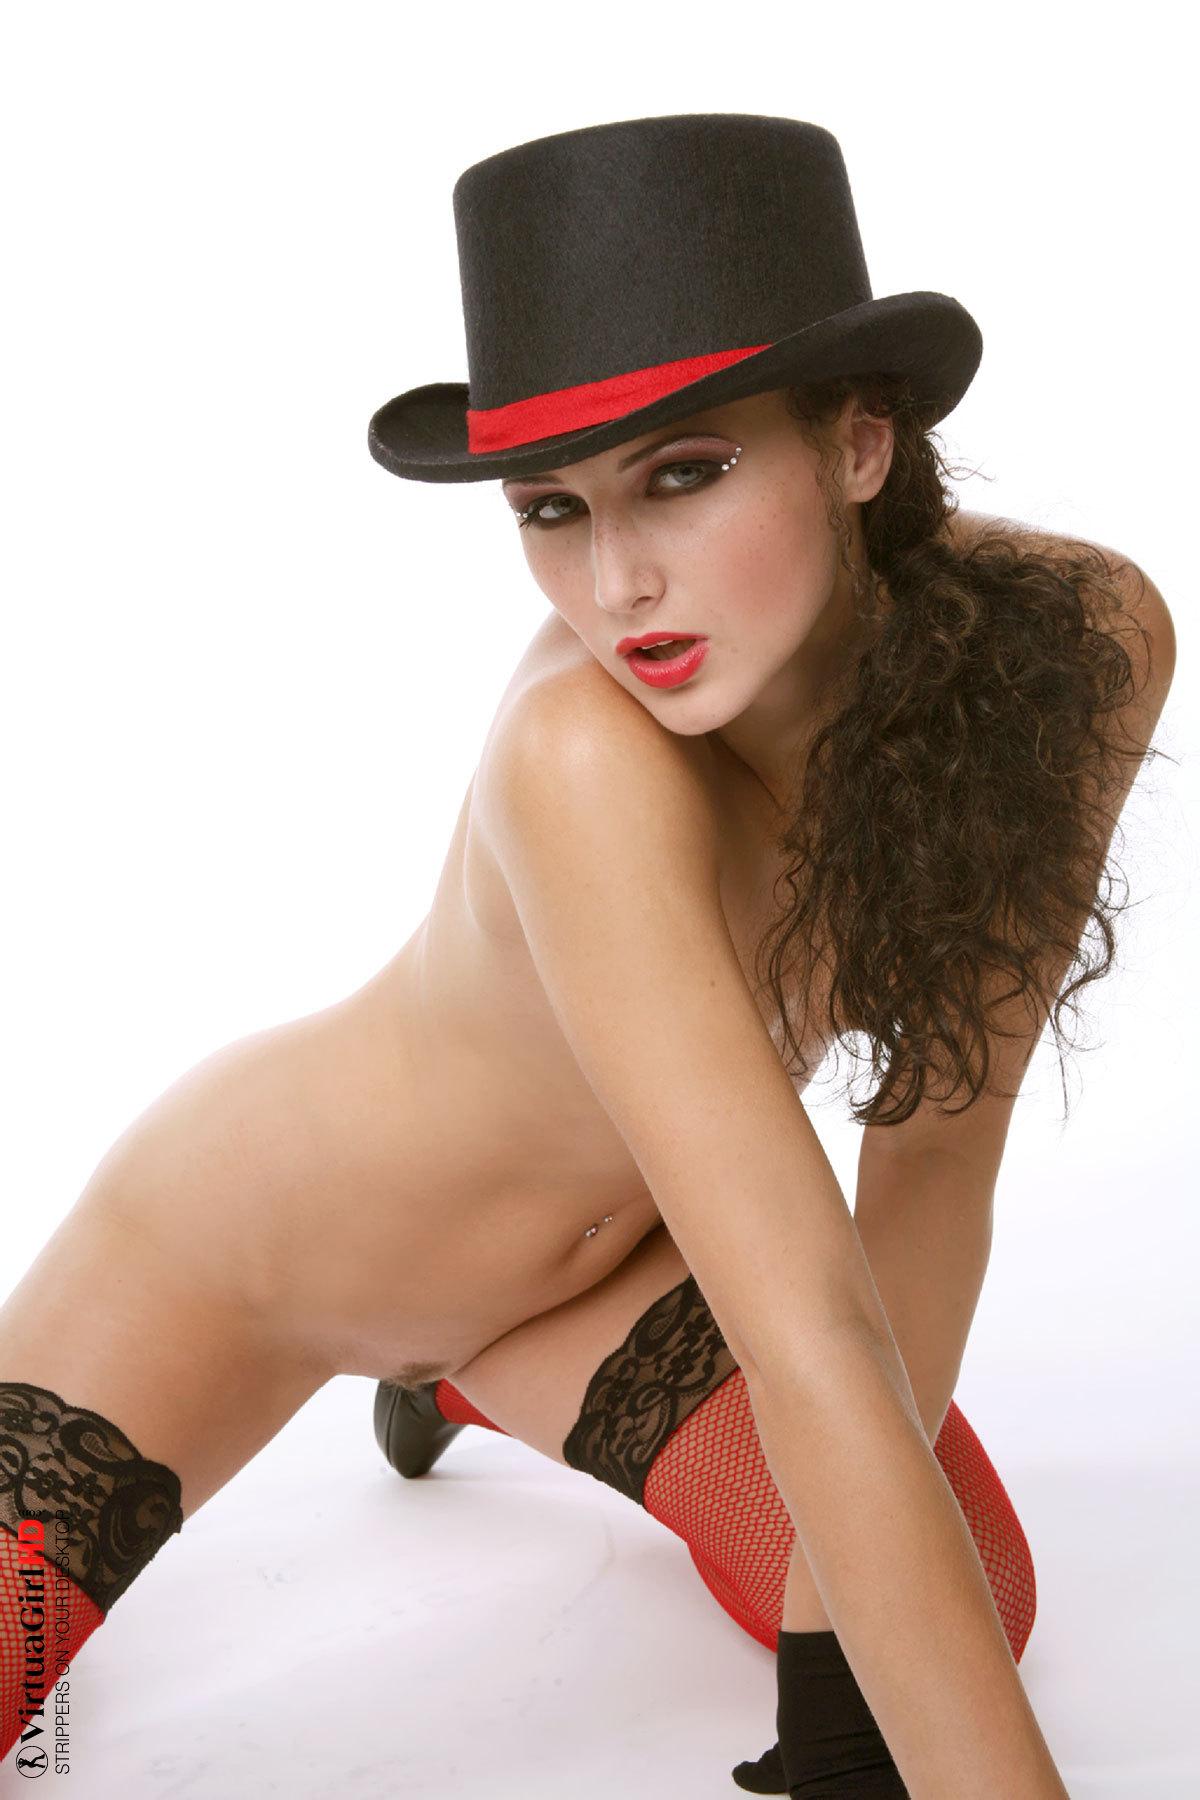 free girls stripping nude